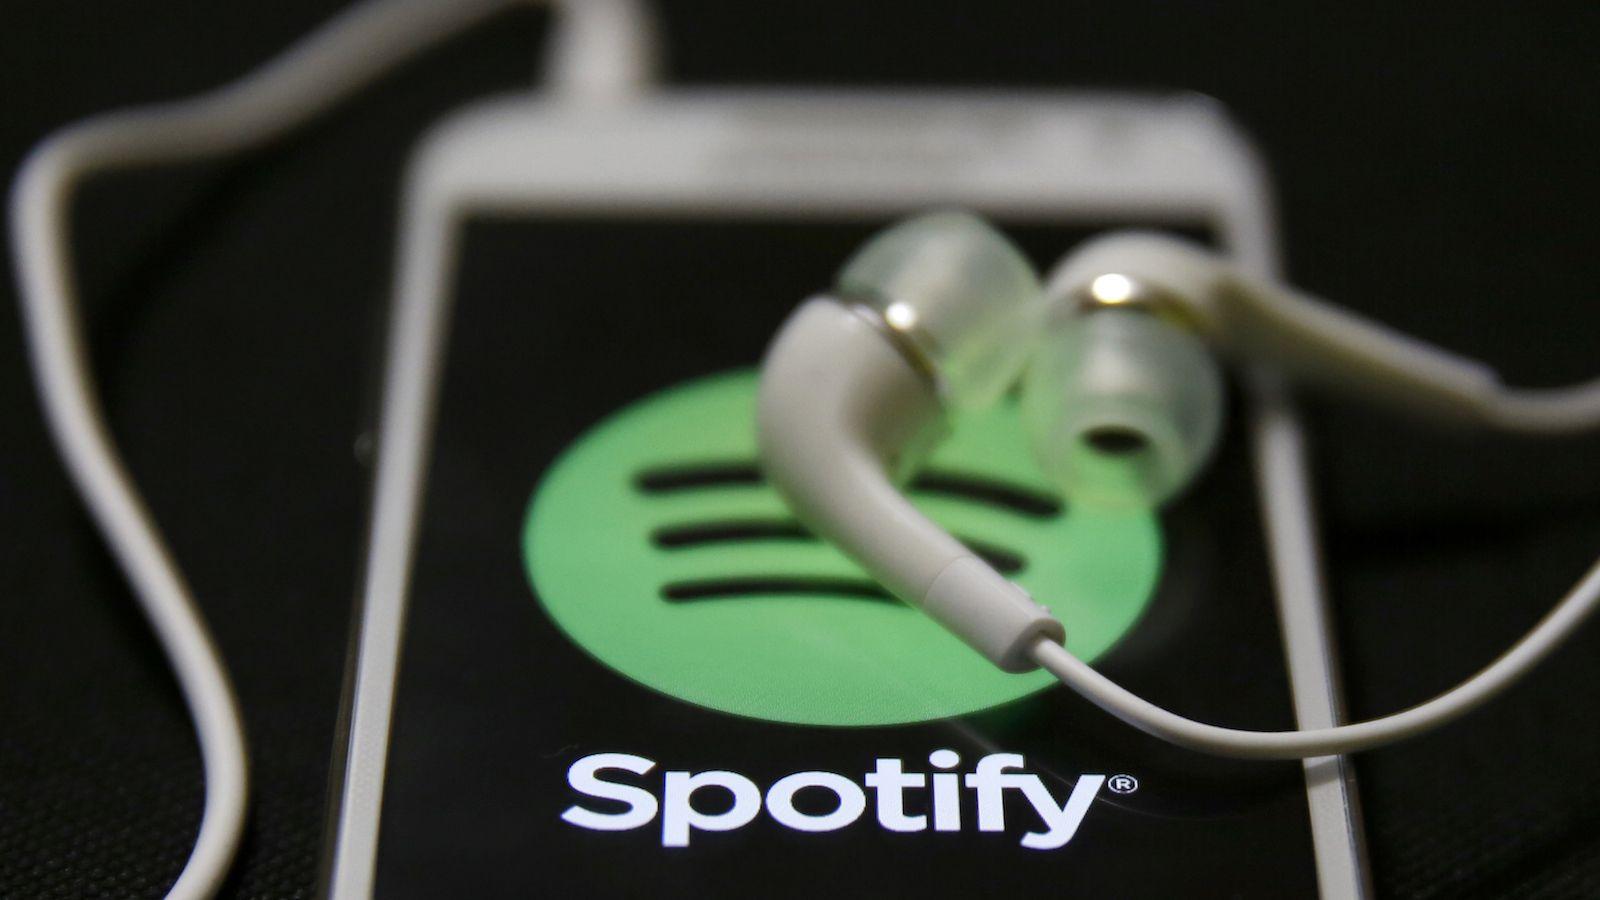 spotify music app wallpaper 62371